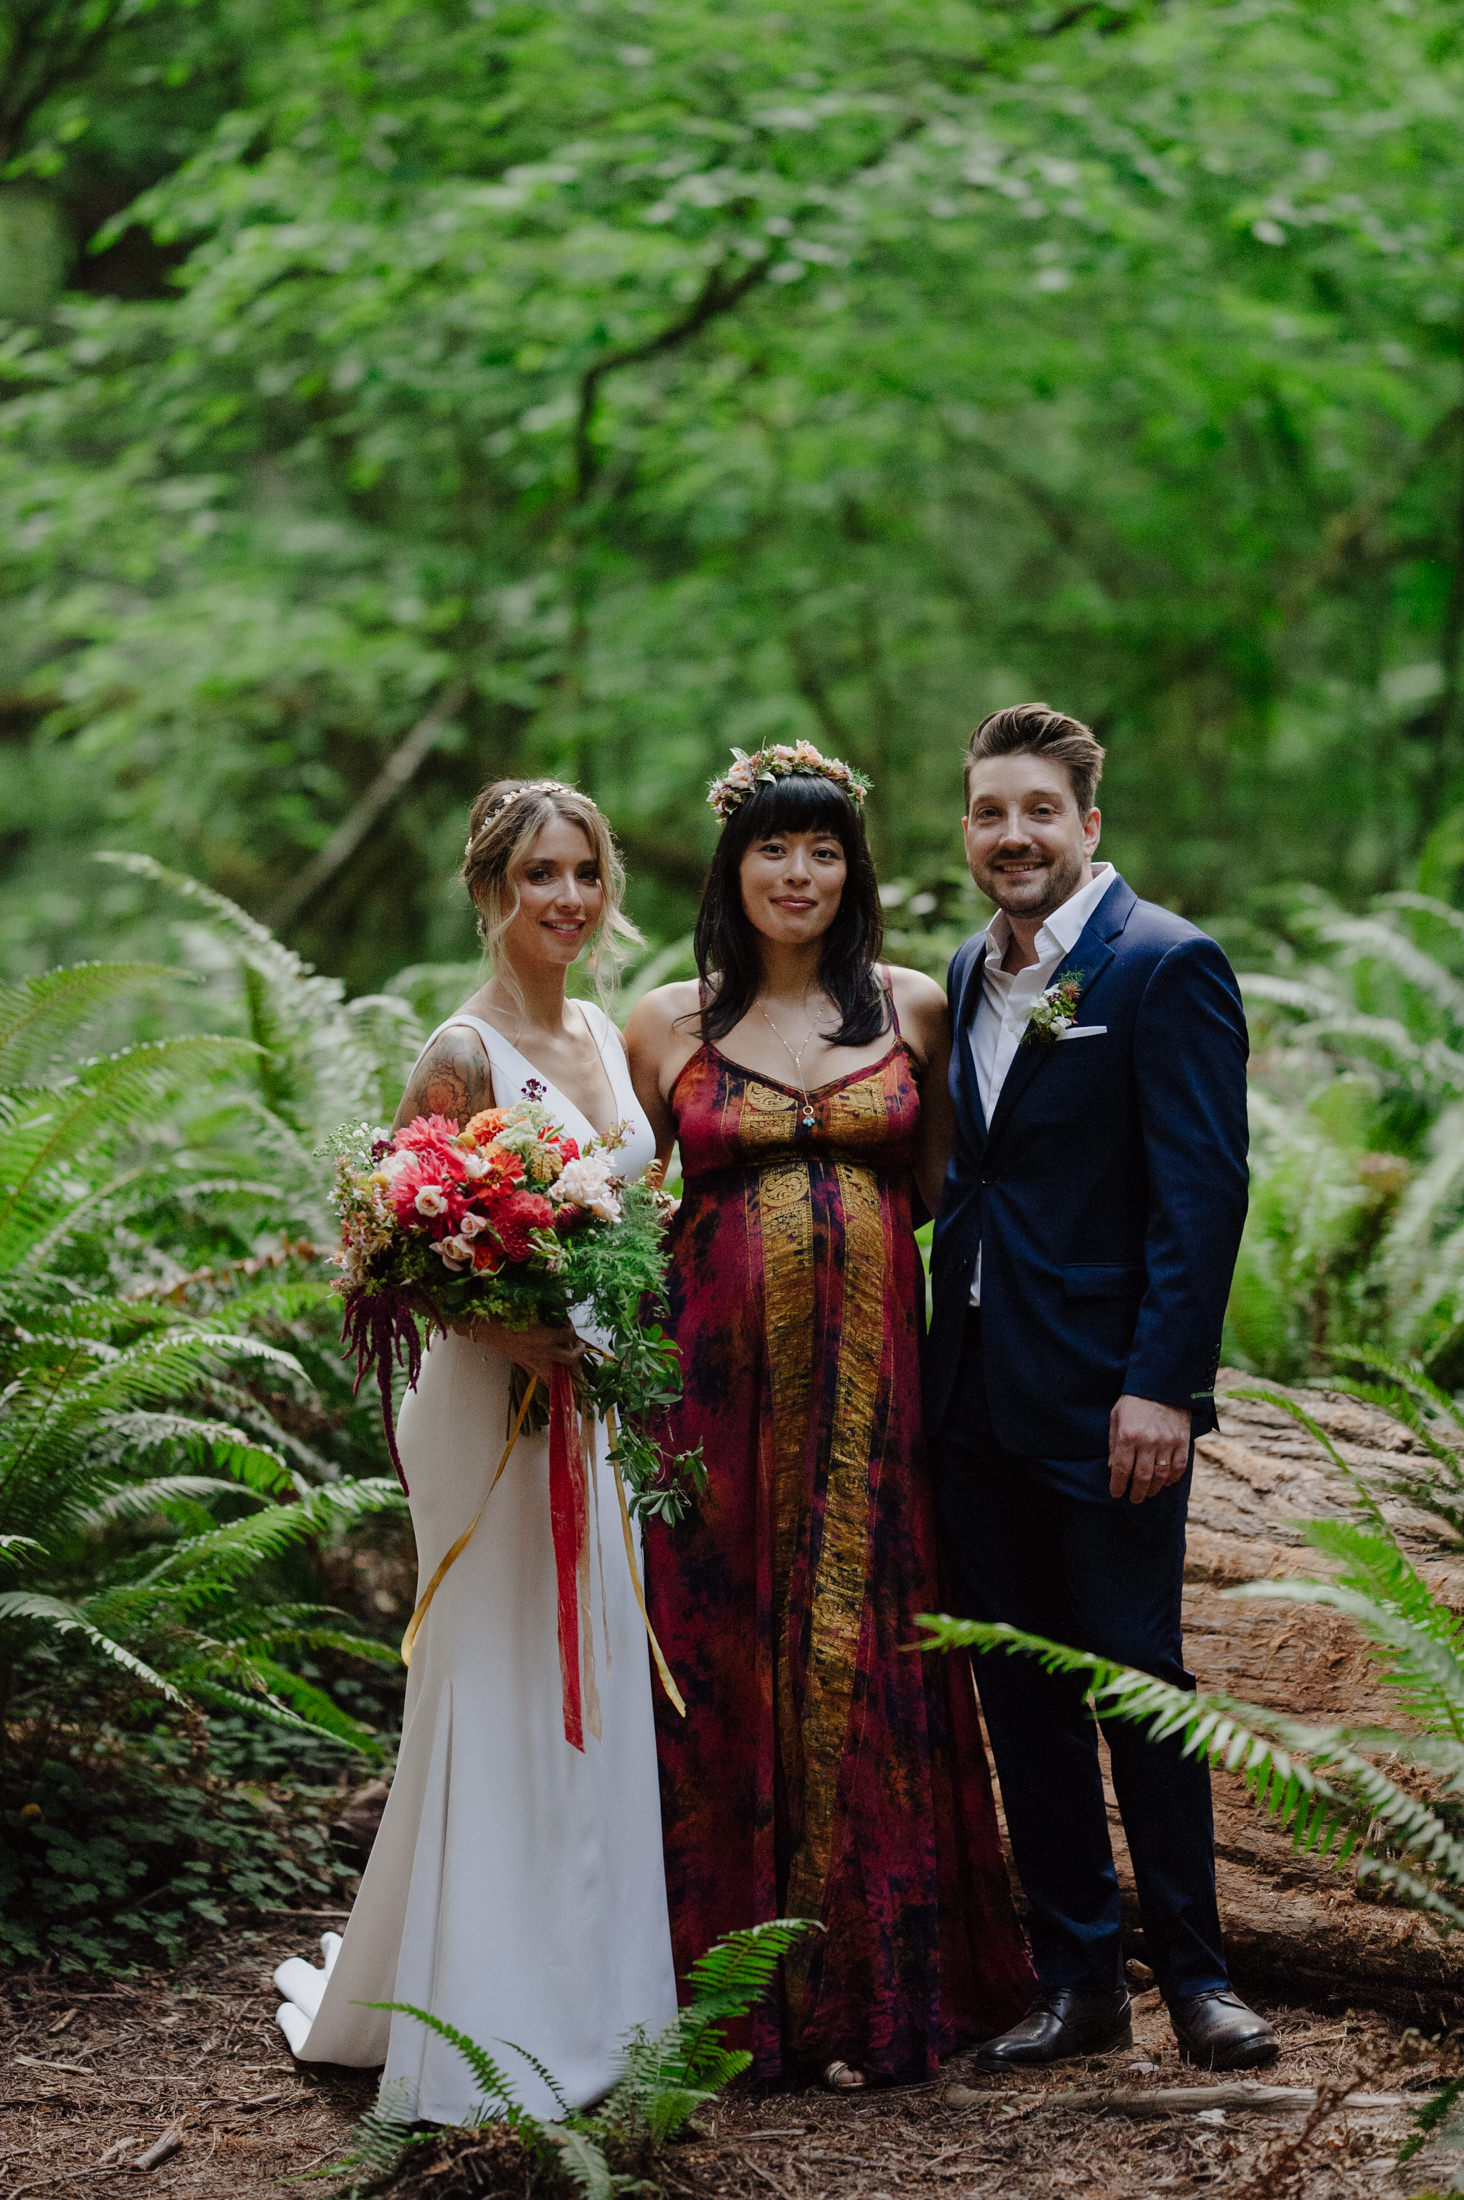 CaliforniaRedwoodDestinationWedding_HumboldtWeddingPhotographer-65.jpg